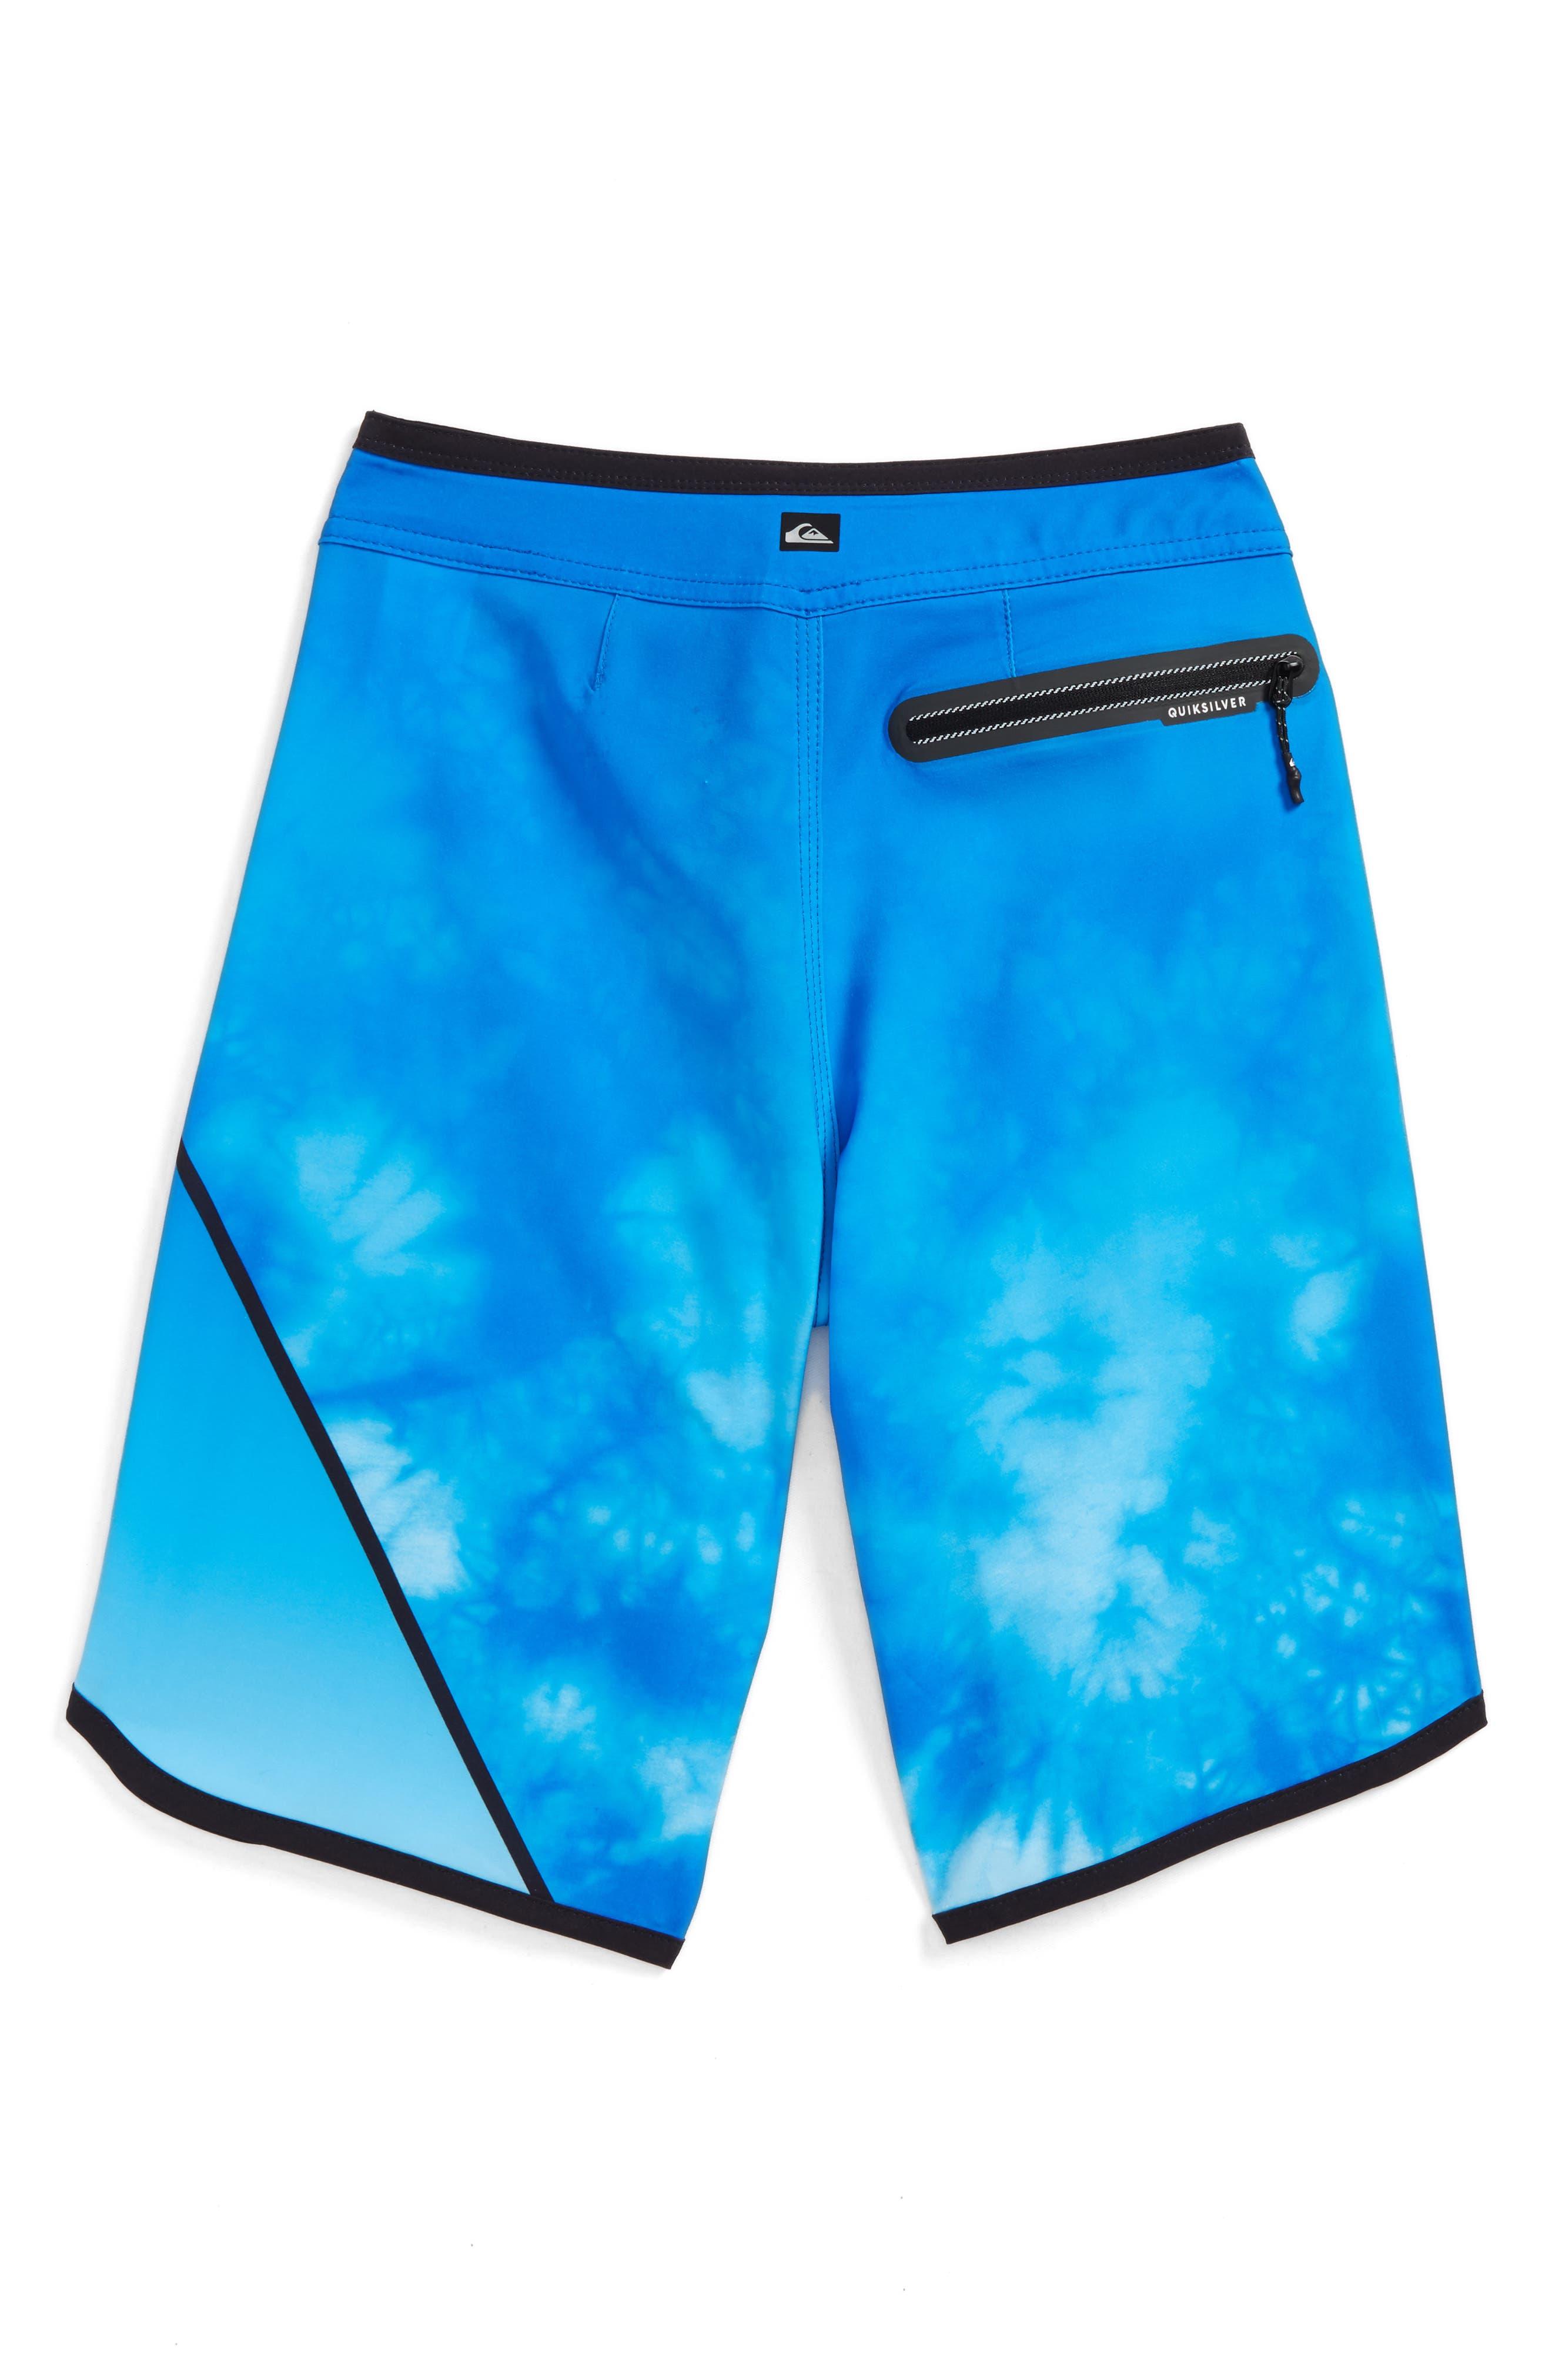 New Wave Board Shorts,                             Alternate thumbnail 3, color,